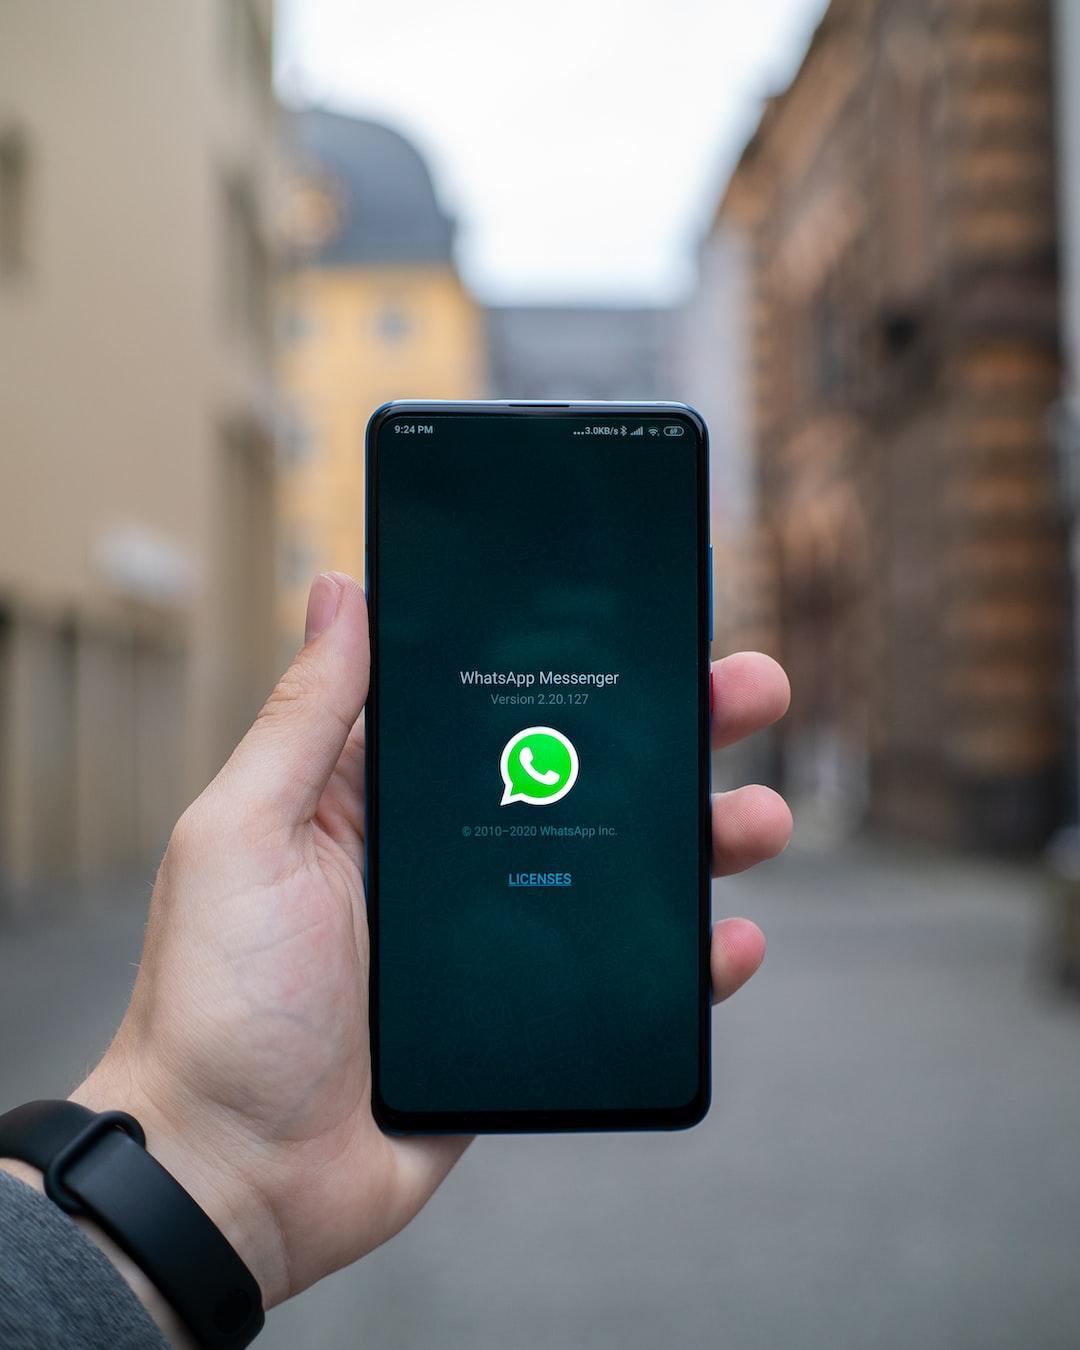 WhatsApp Messenger Splashscreen. Can also be used for Mockups!